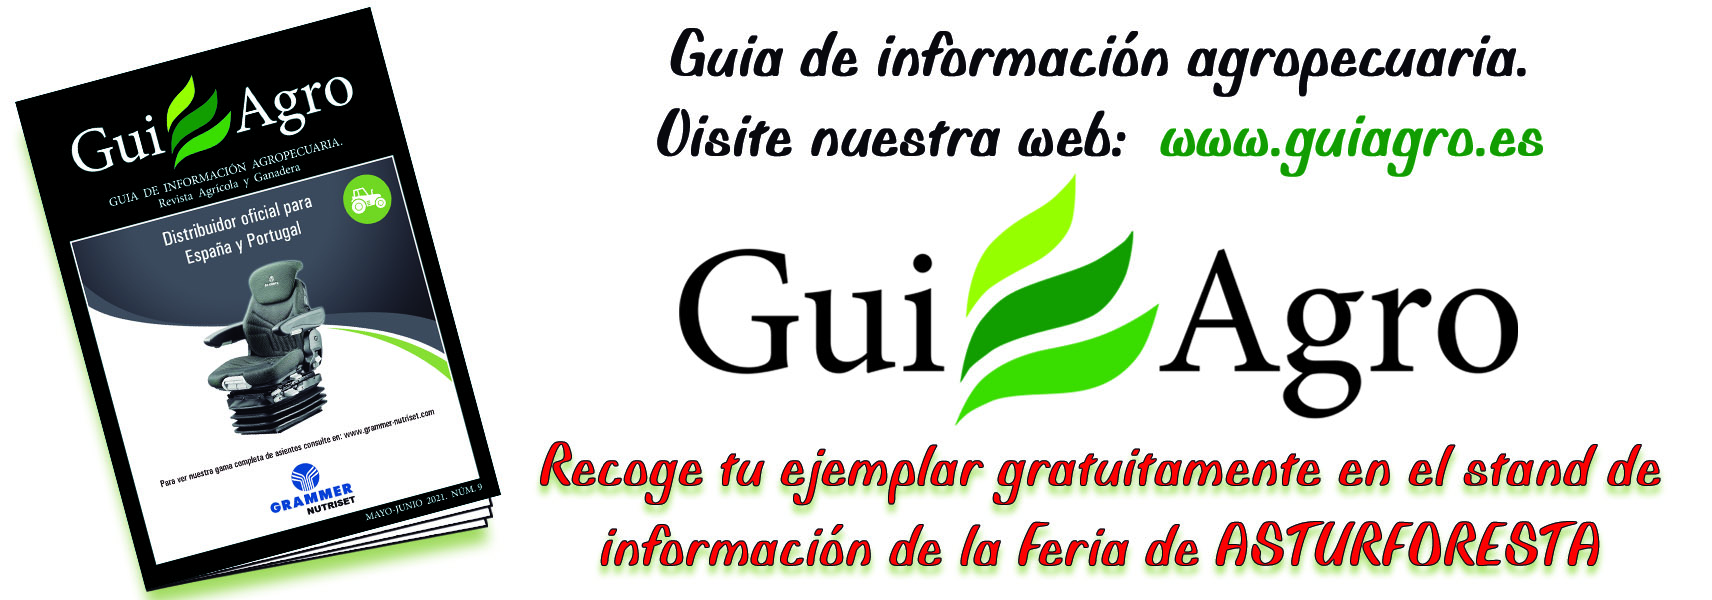 GuiAgro